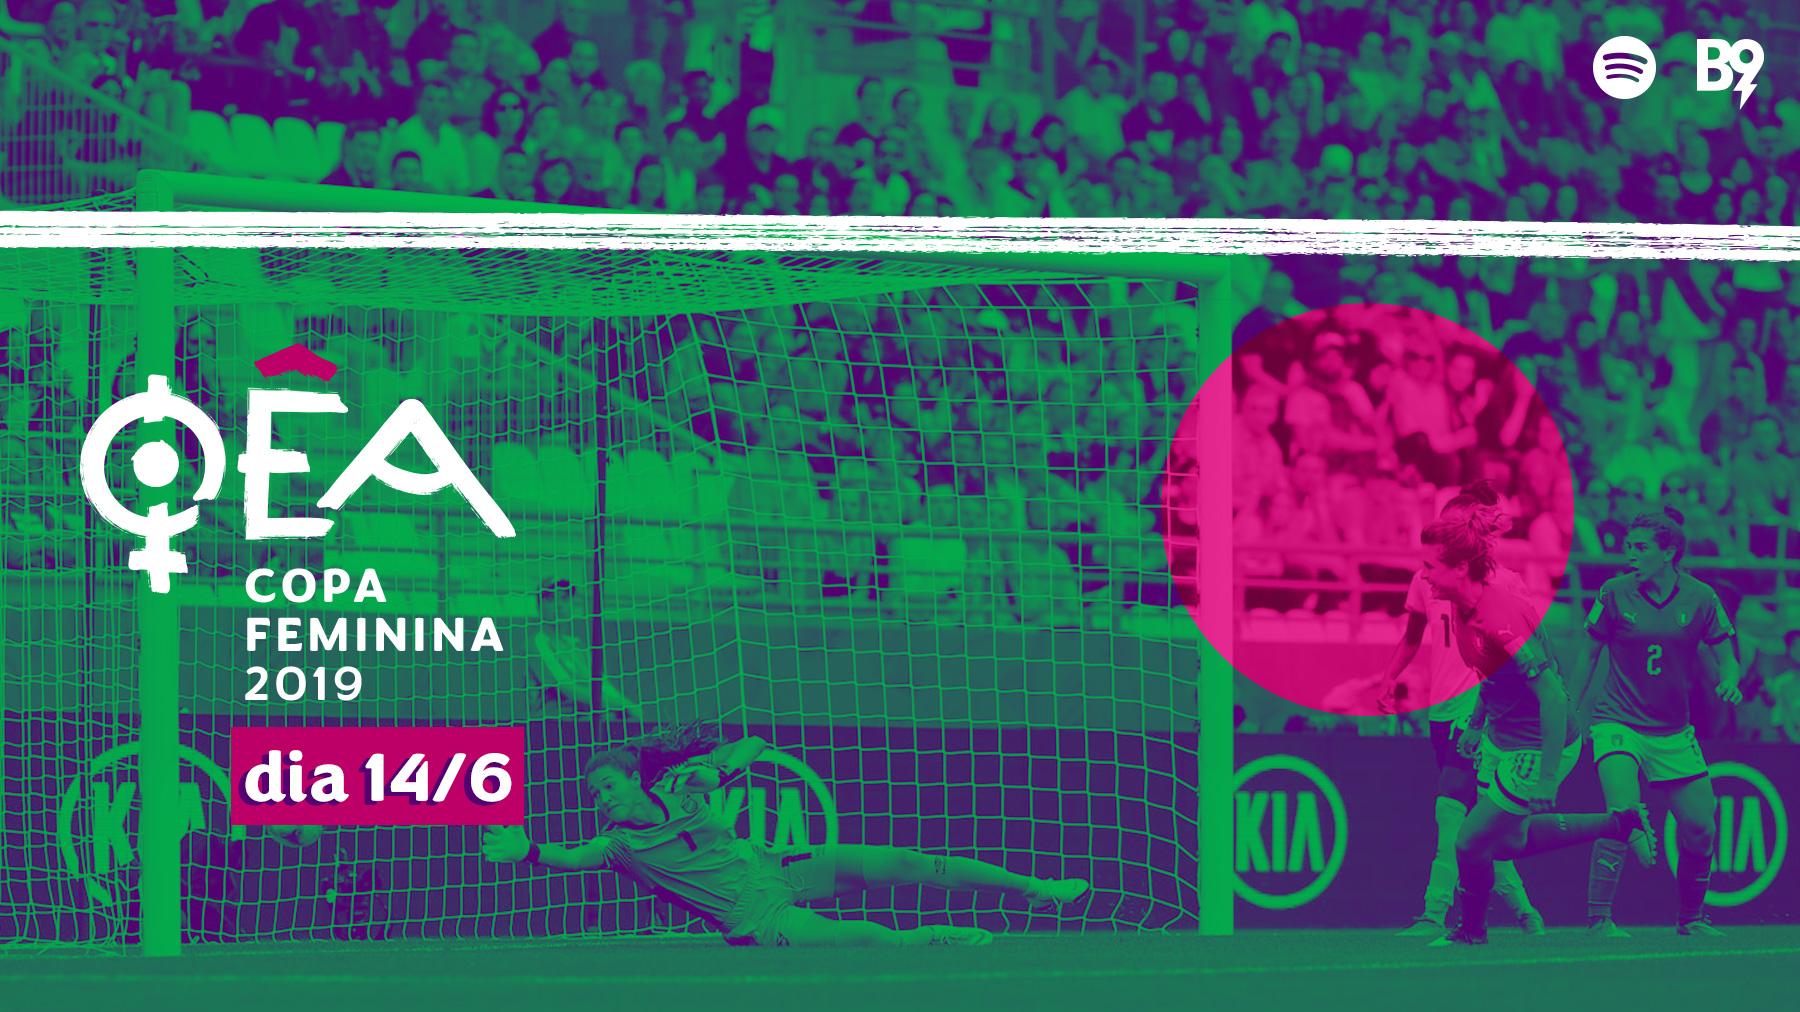 Oêa: Copa 2019 — 🇯🇵 2-1 🏴 / 🇯🇲 0-5 🇮🇹 / 🏴 1-0 🇦🇷